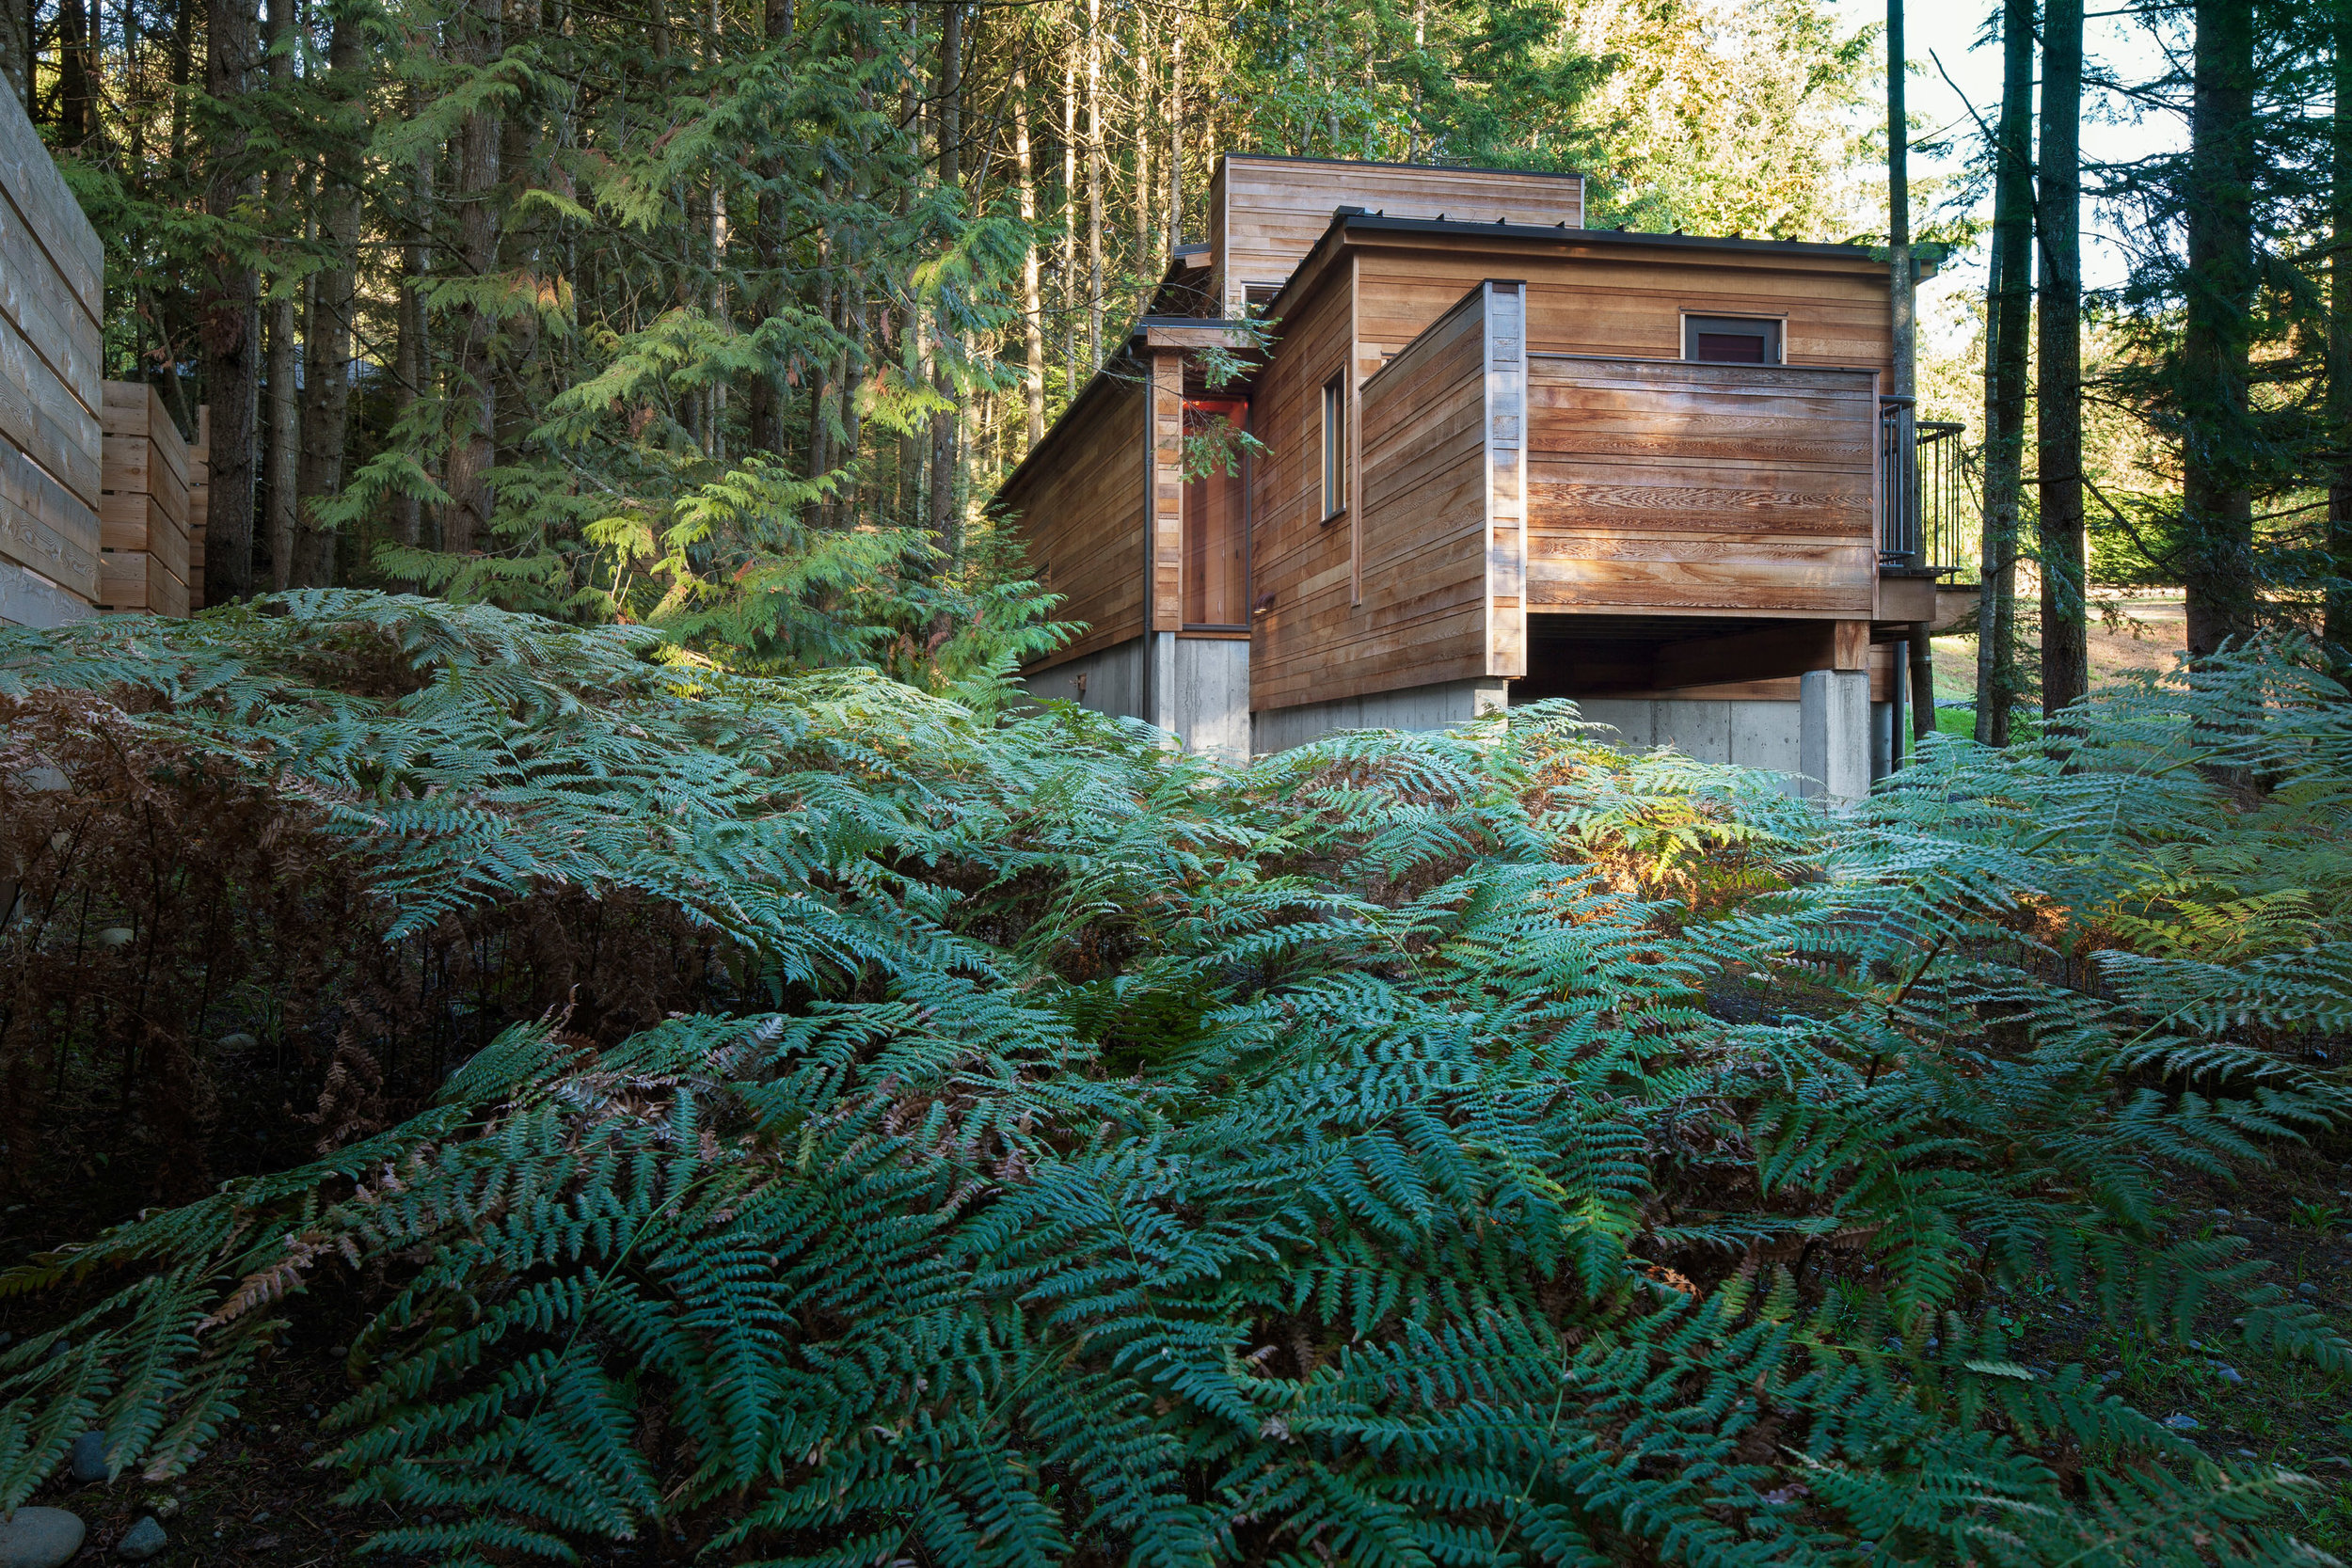 Agathom Co.,   Retraite de la forêt  , 2014, Vancouver Island, British Columbia, Canada. credit: Steven Evans